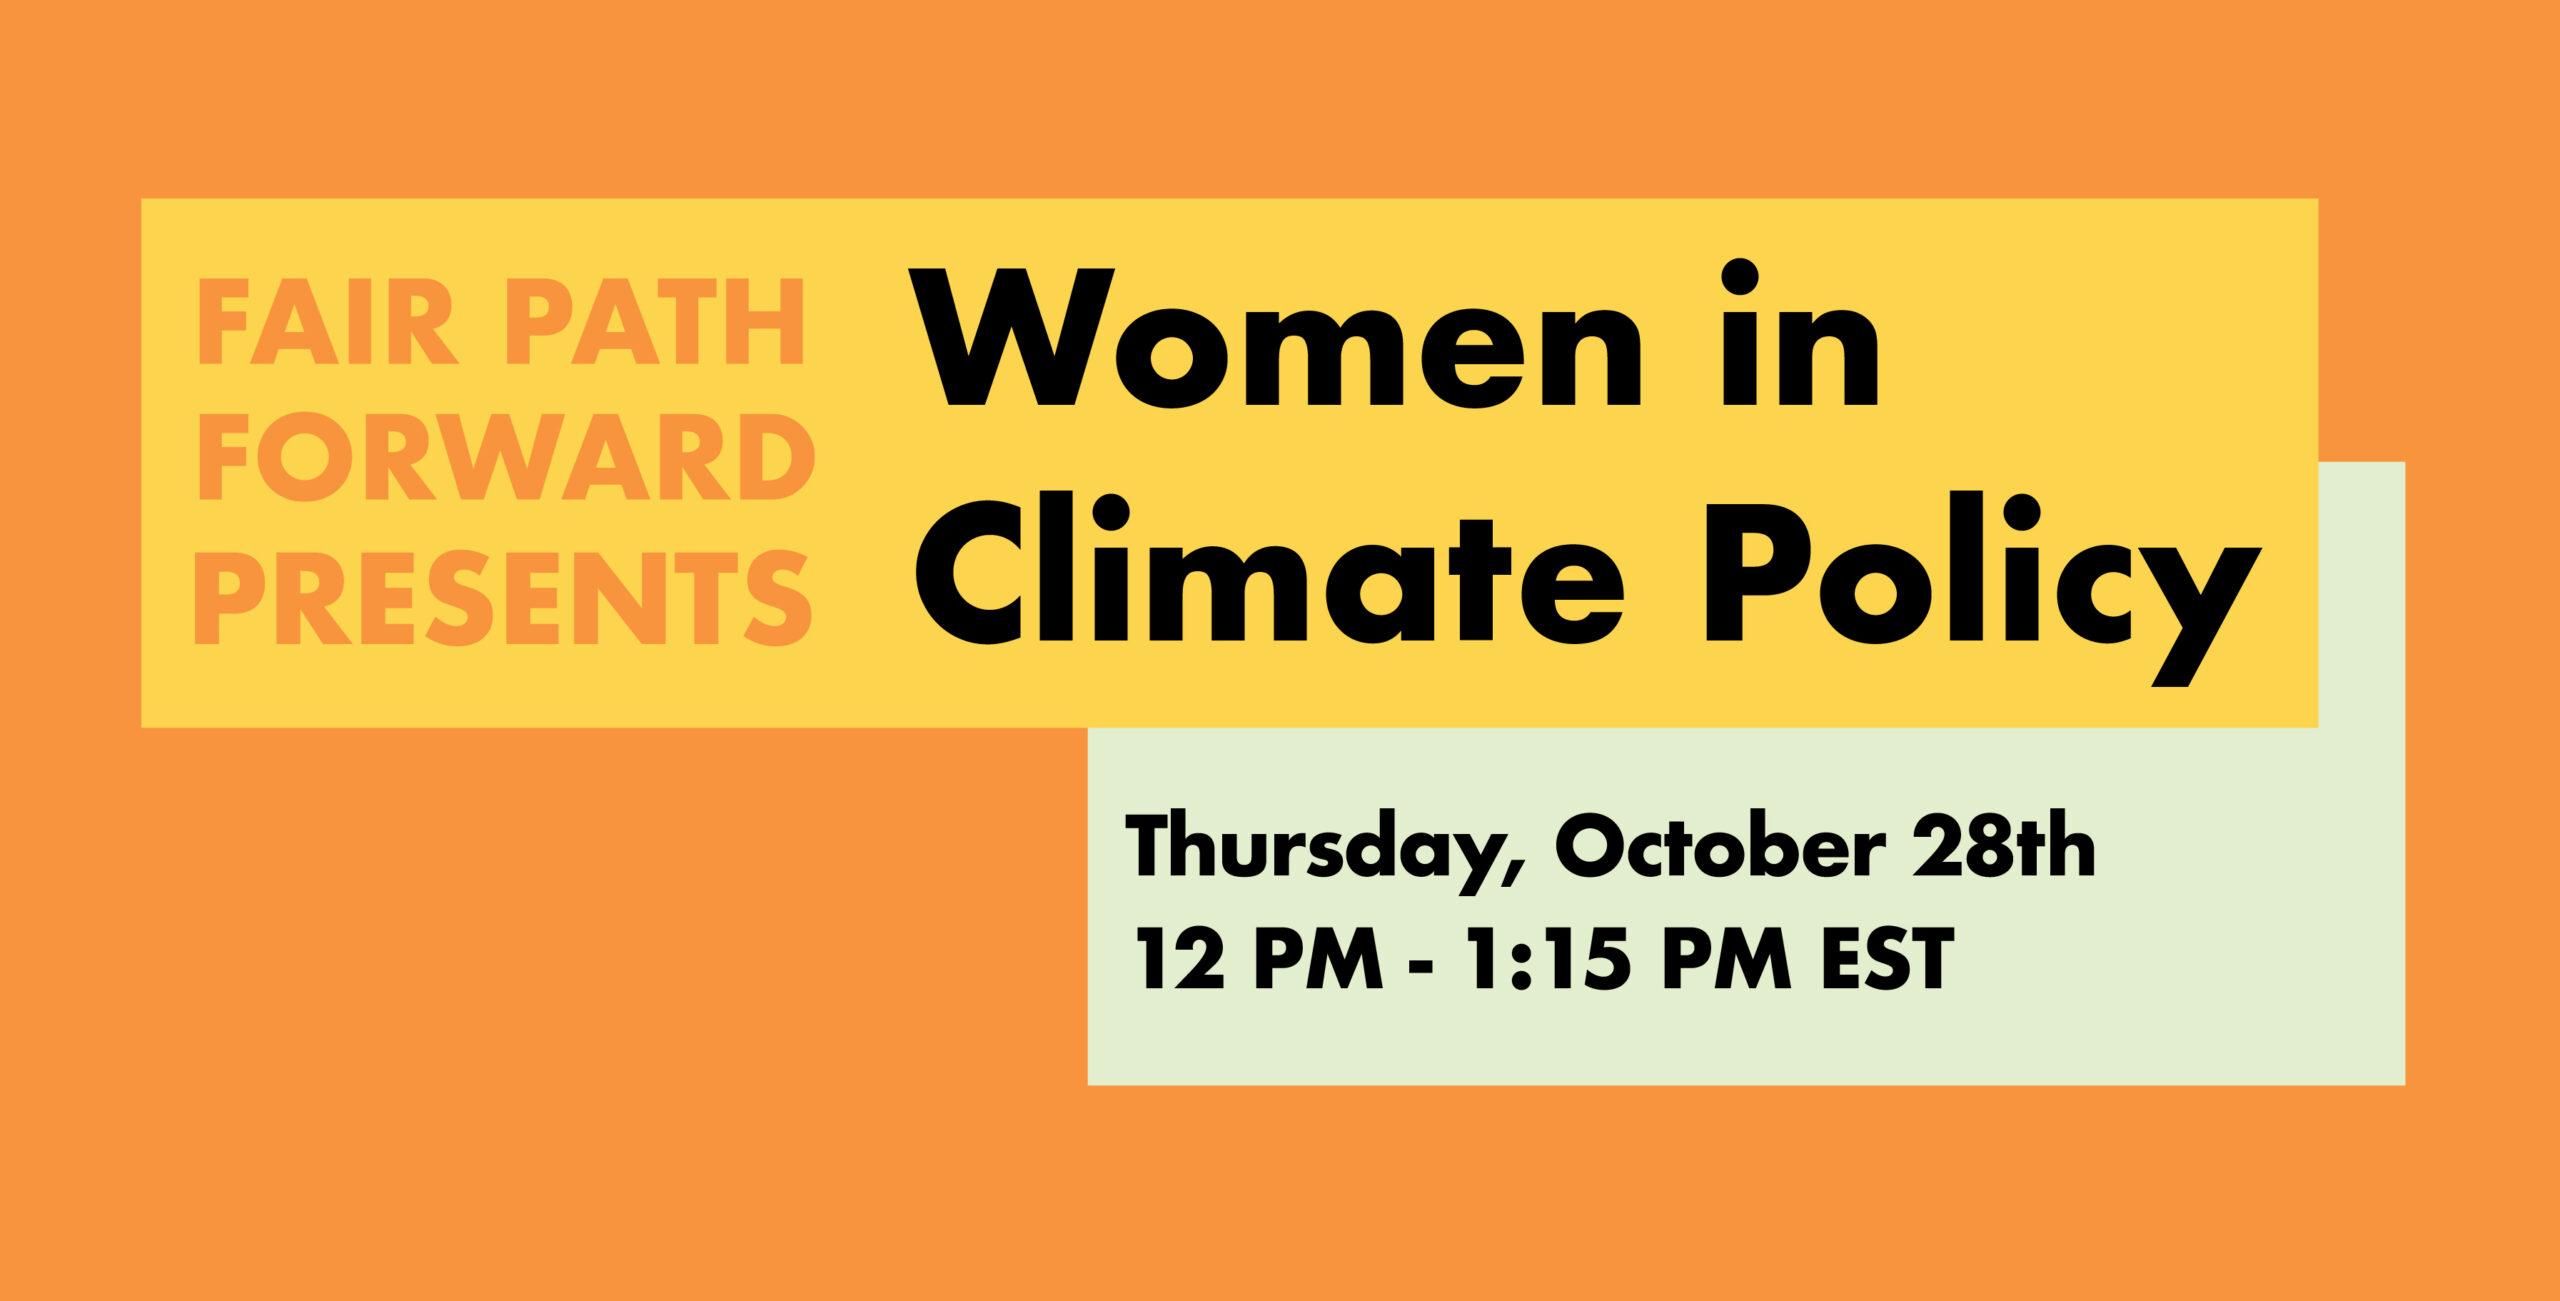 event info: October 28th, 12-1:15 PM EST